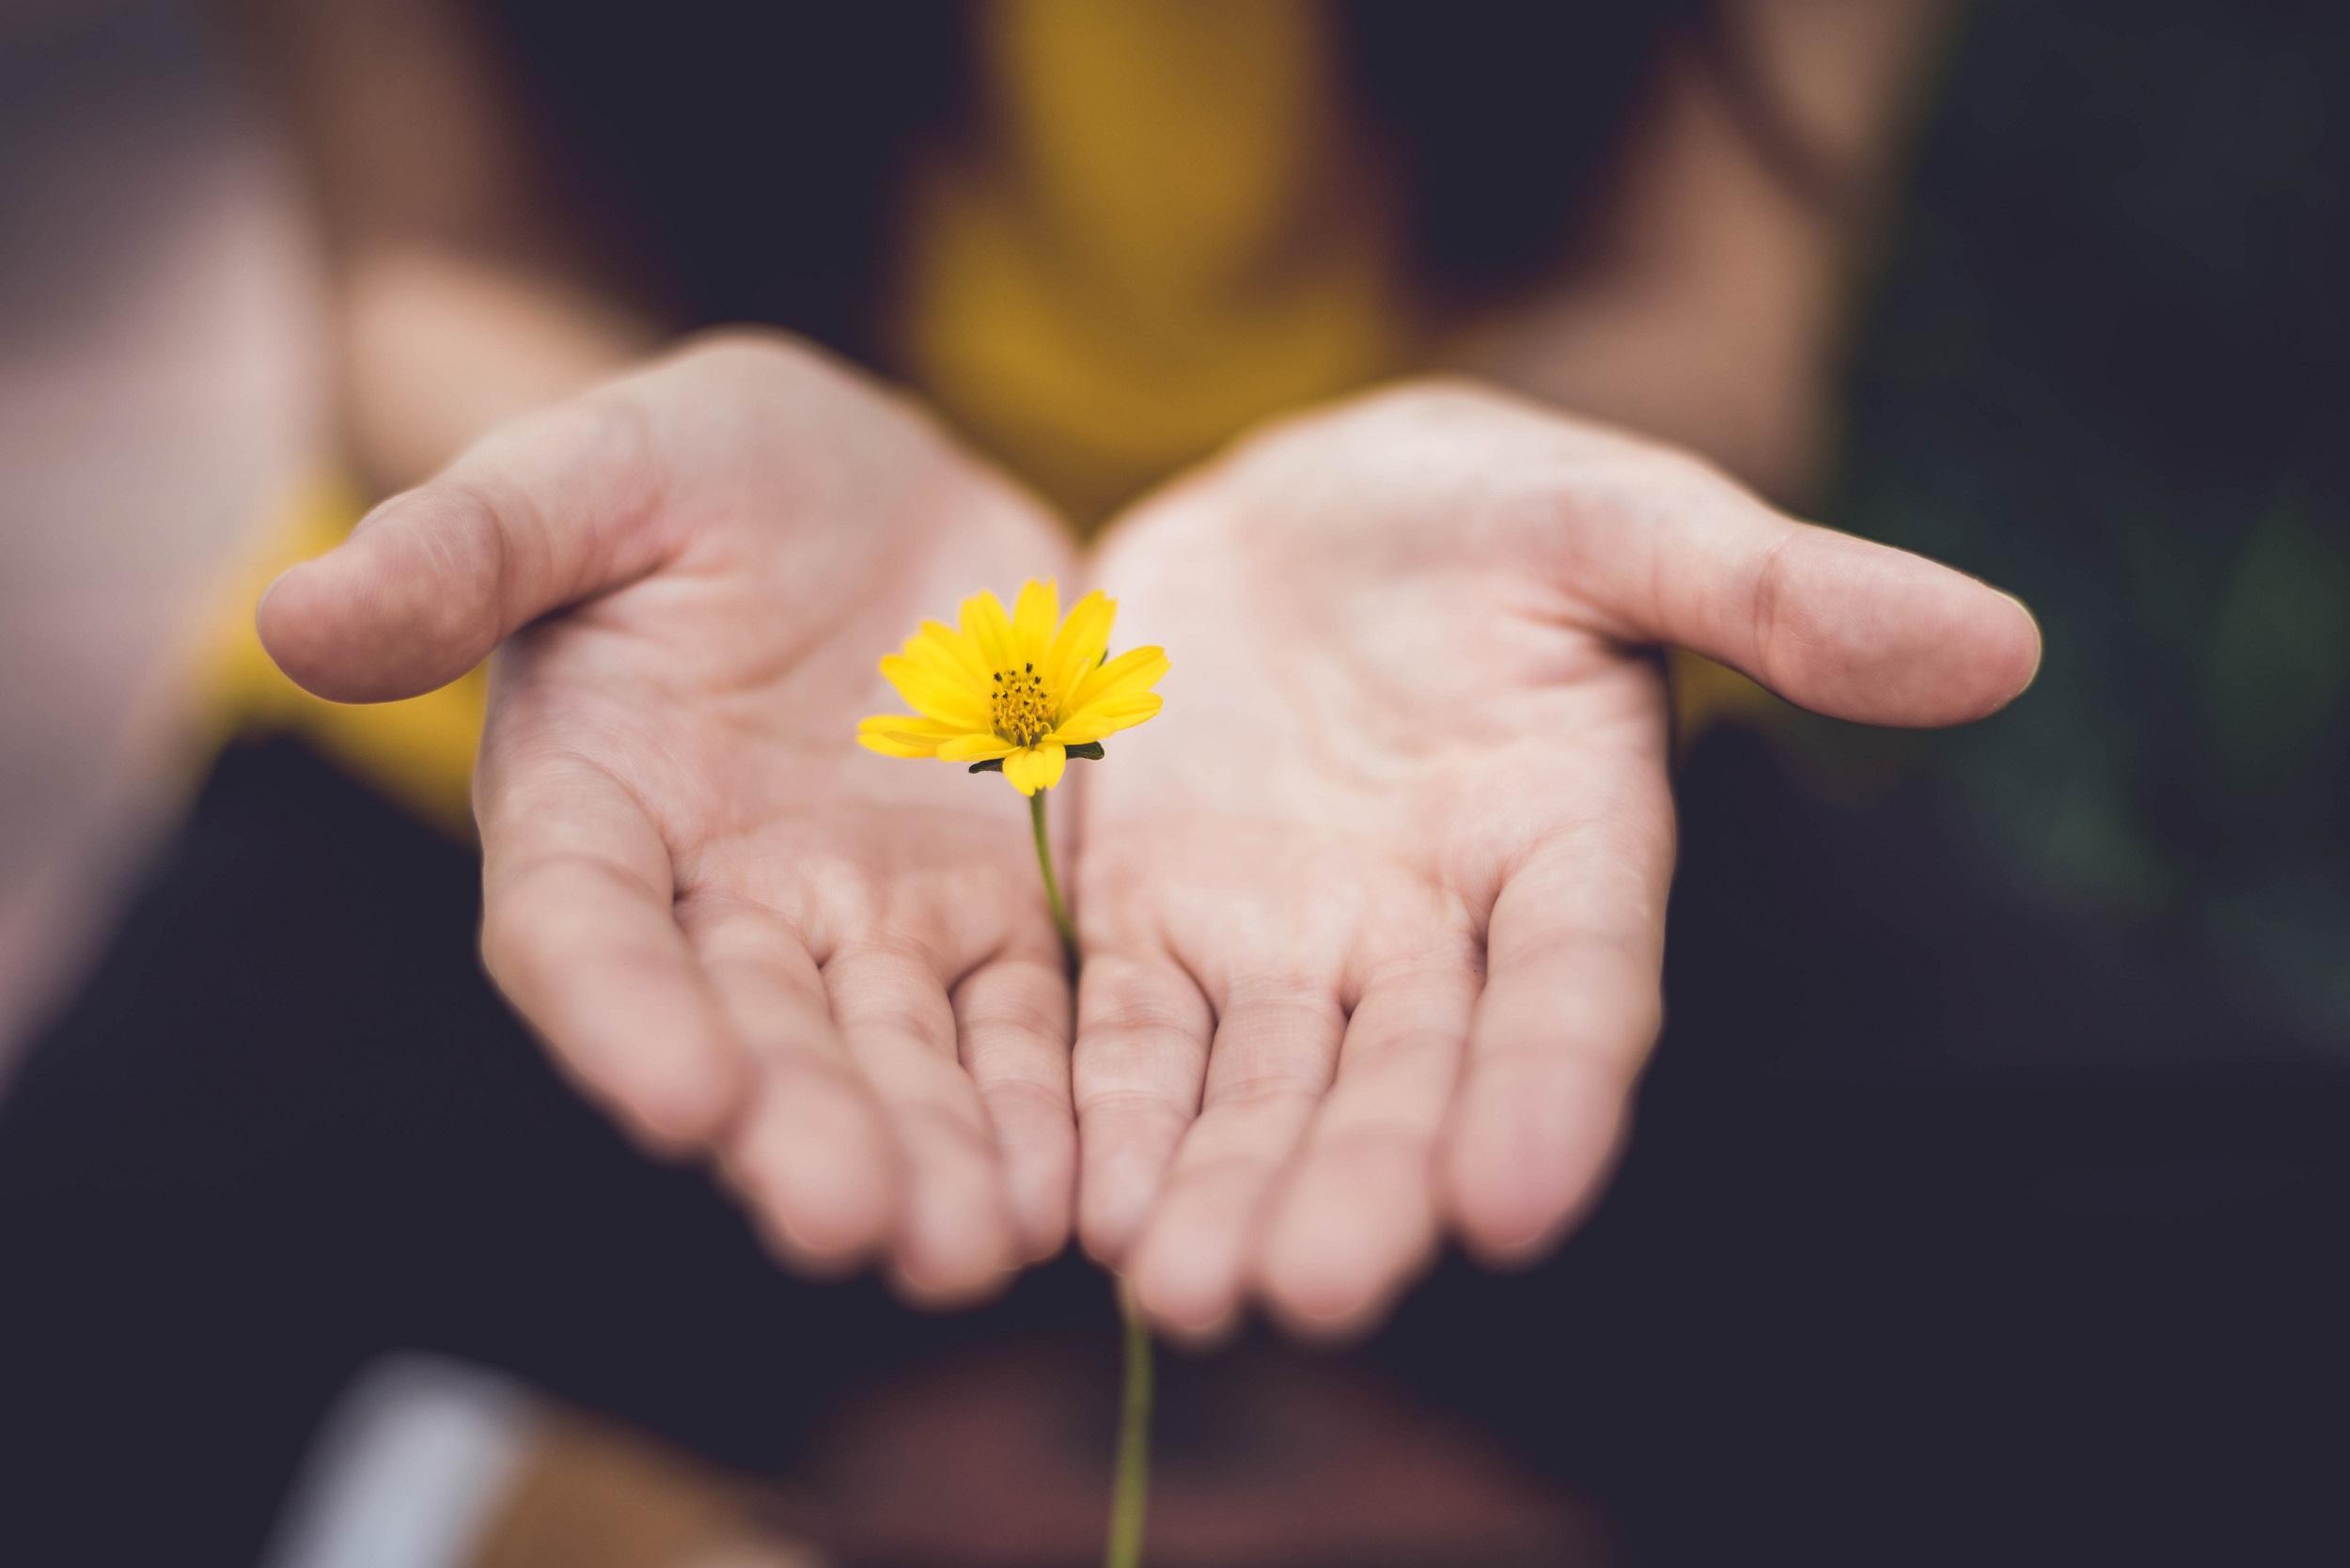 Serenity - Nos valeurs